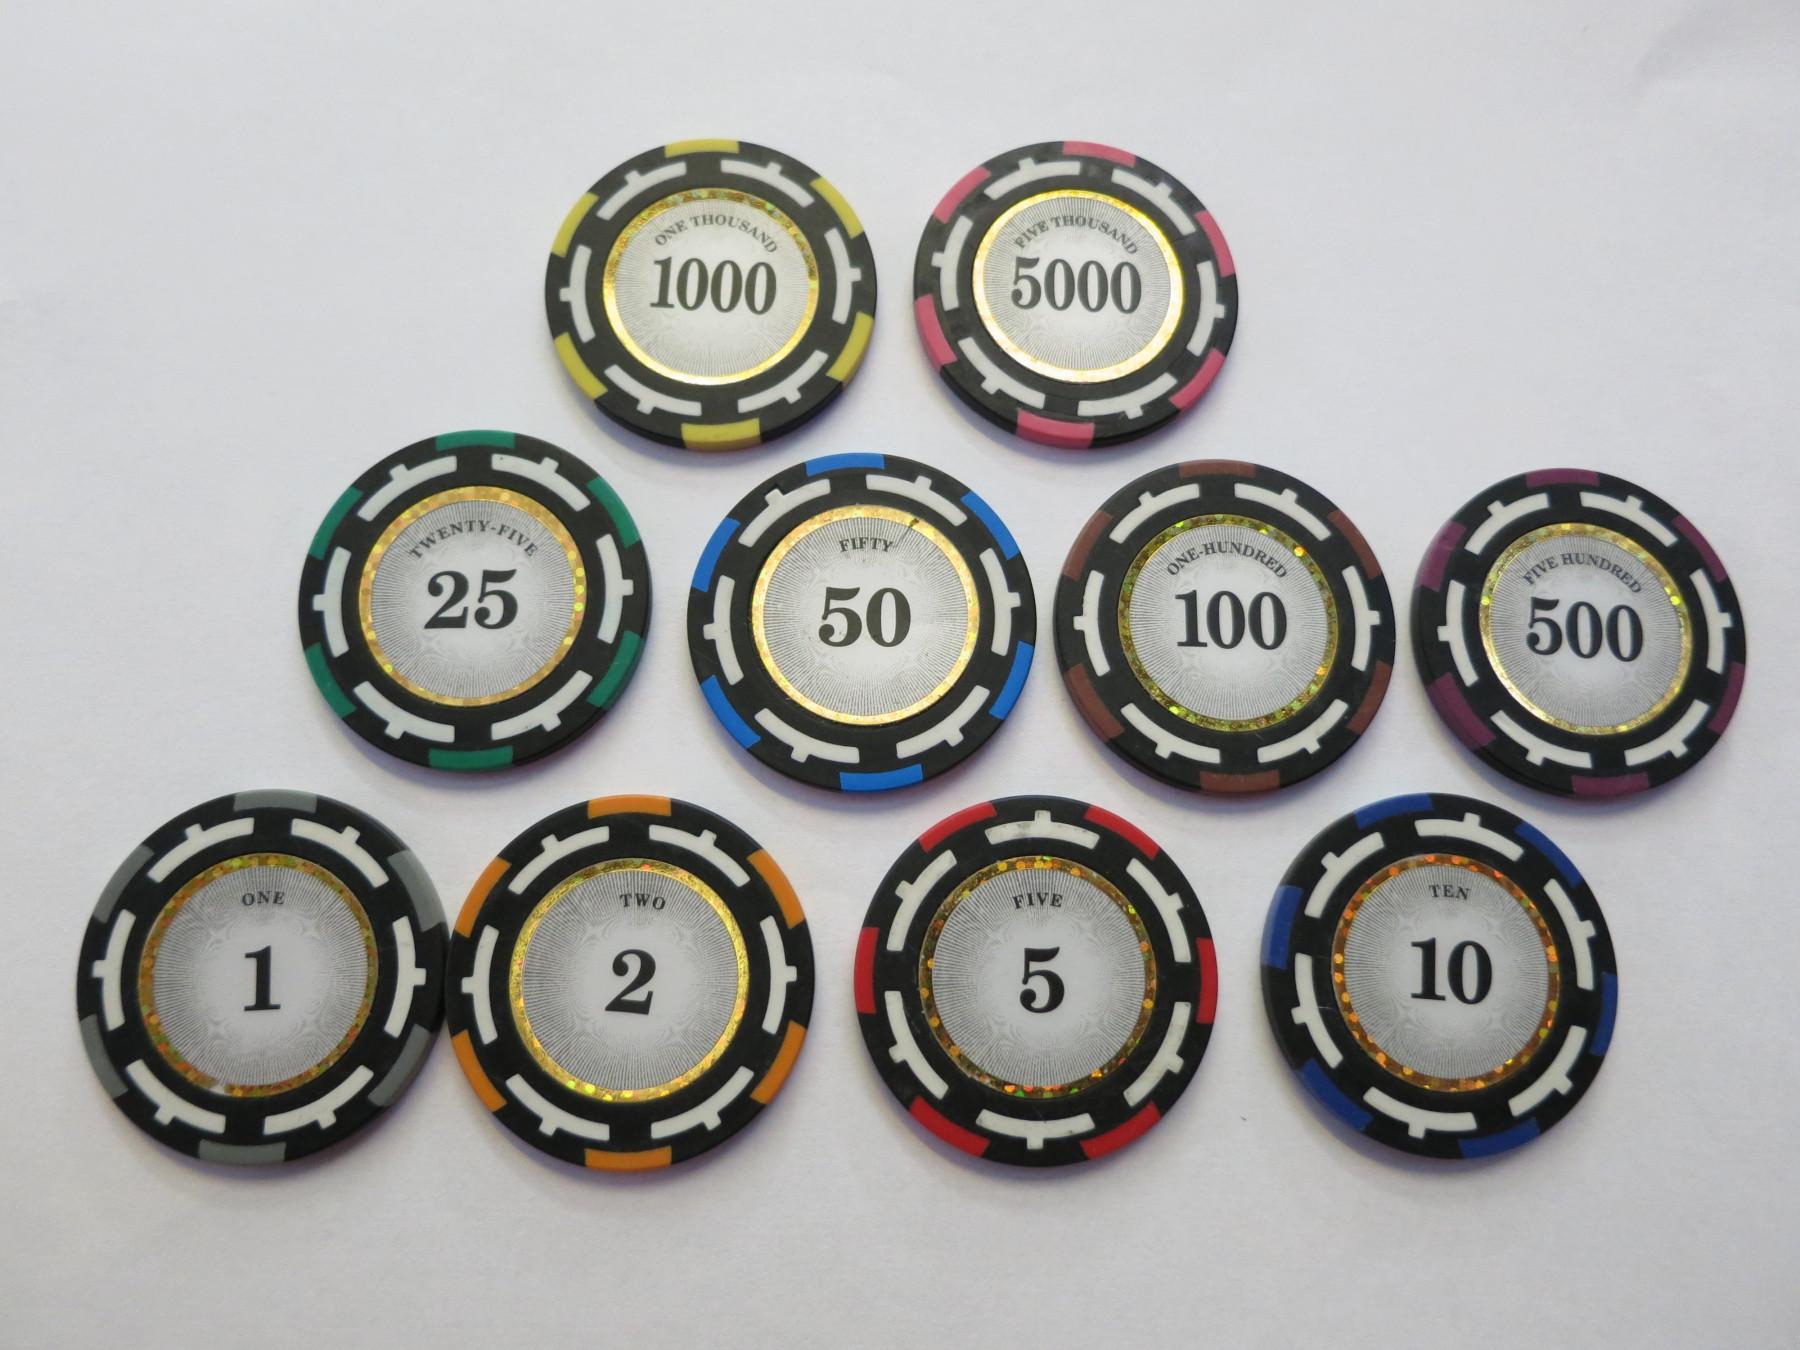 Chipkoffer Set mit 500 Vision Clay Chips